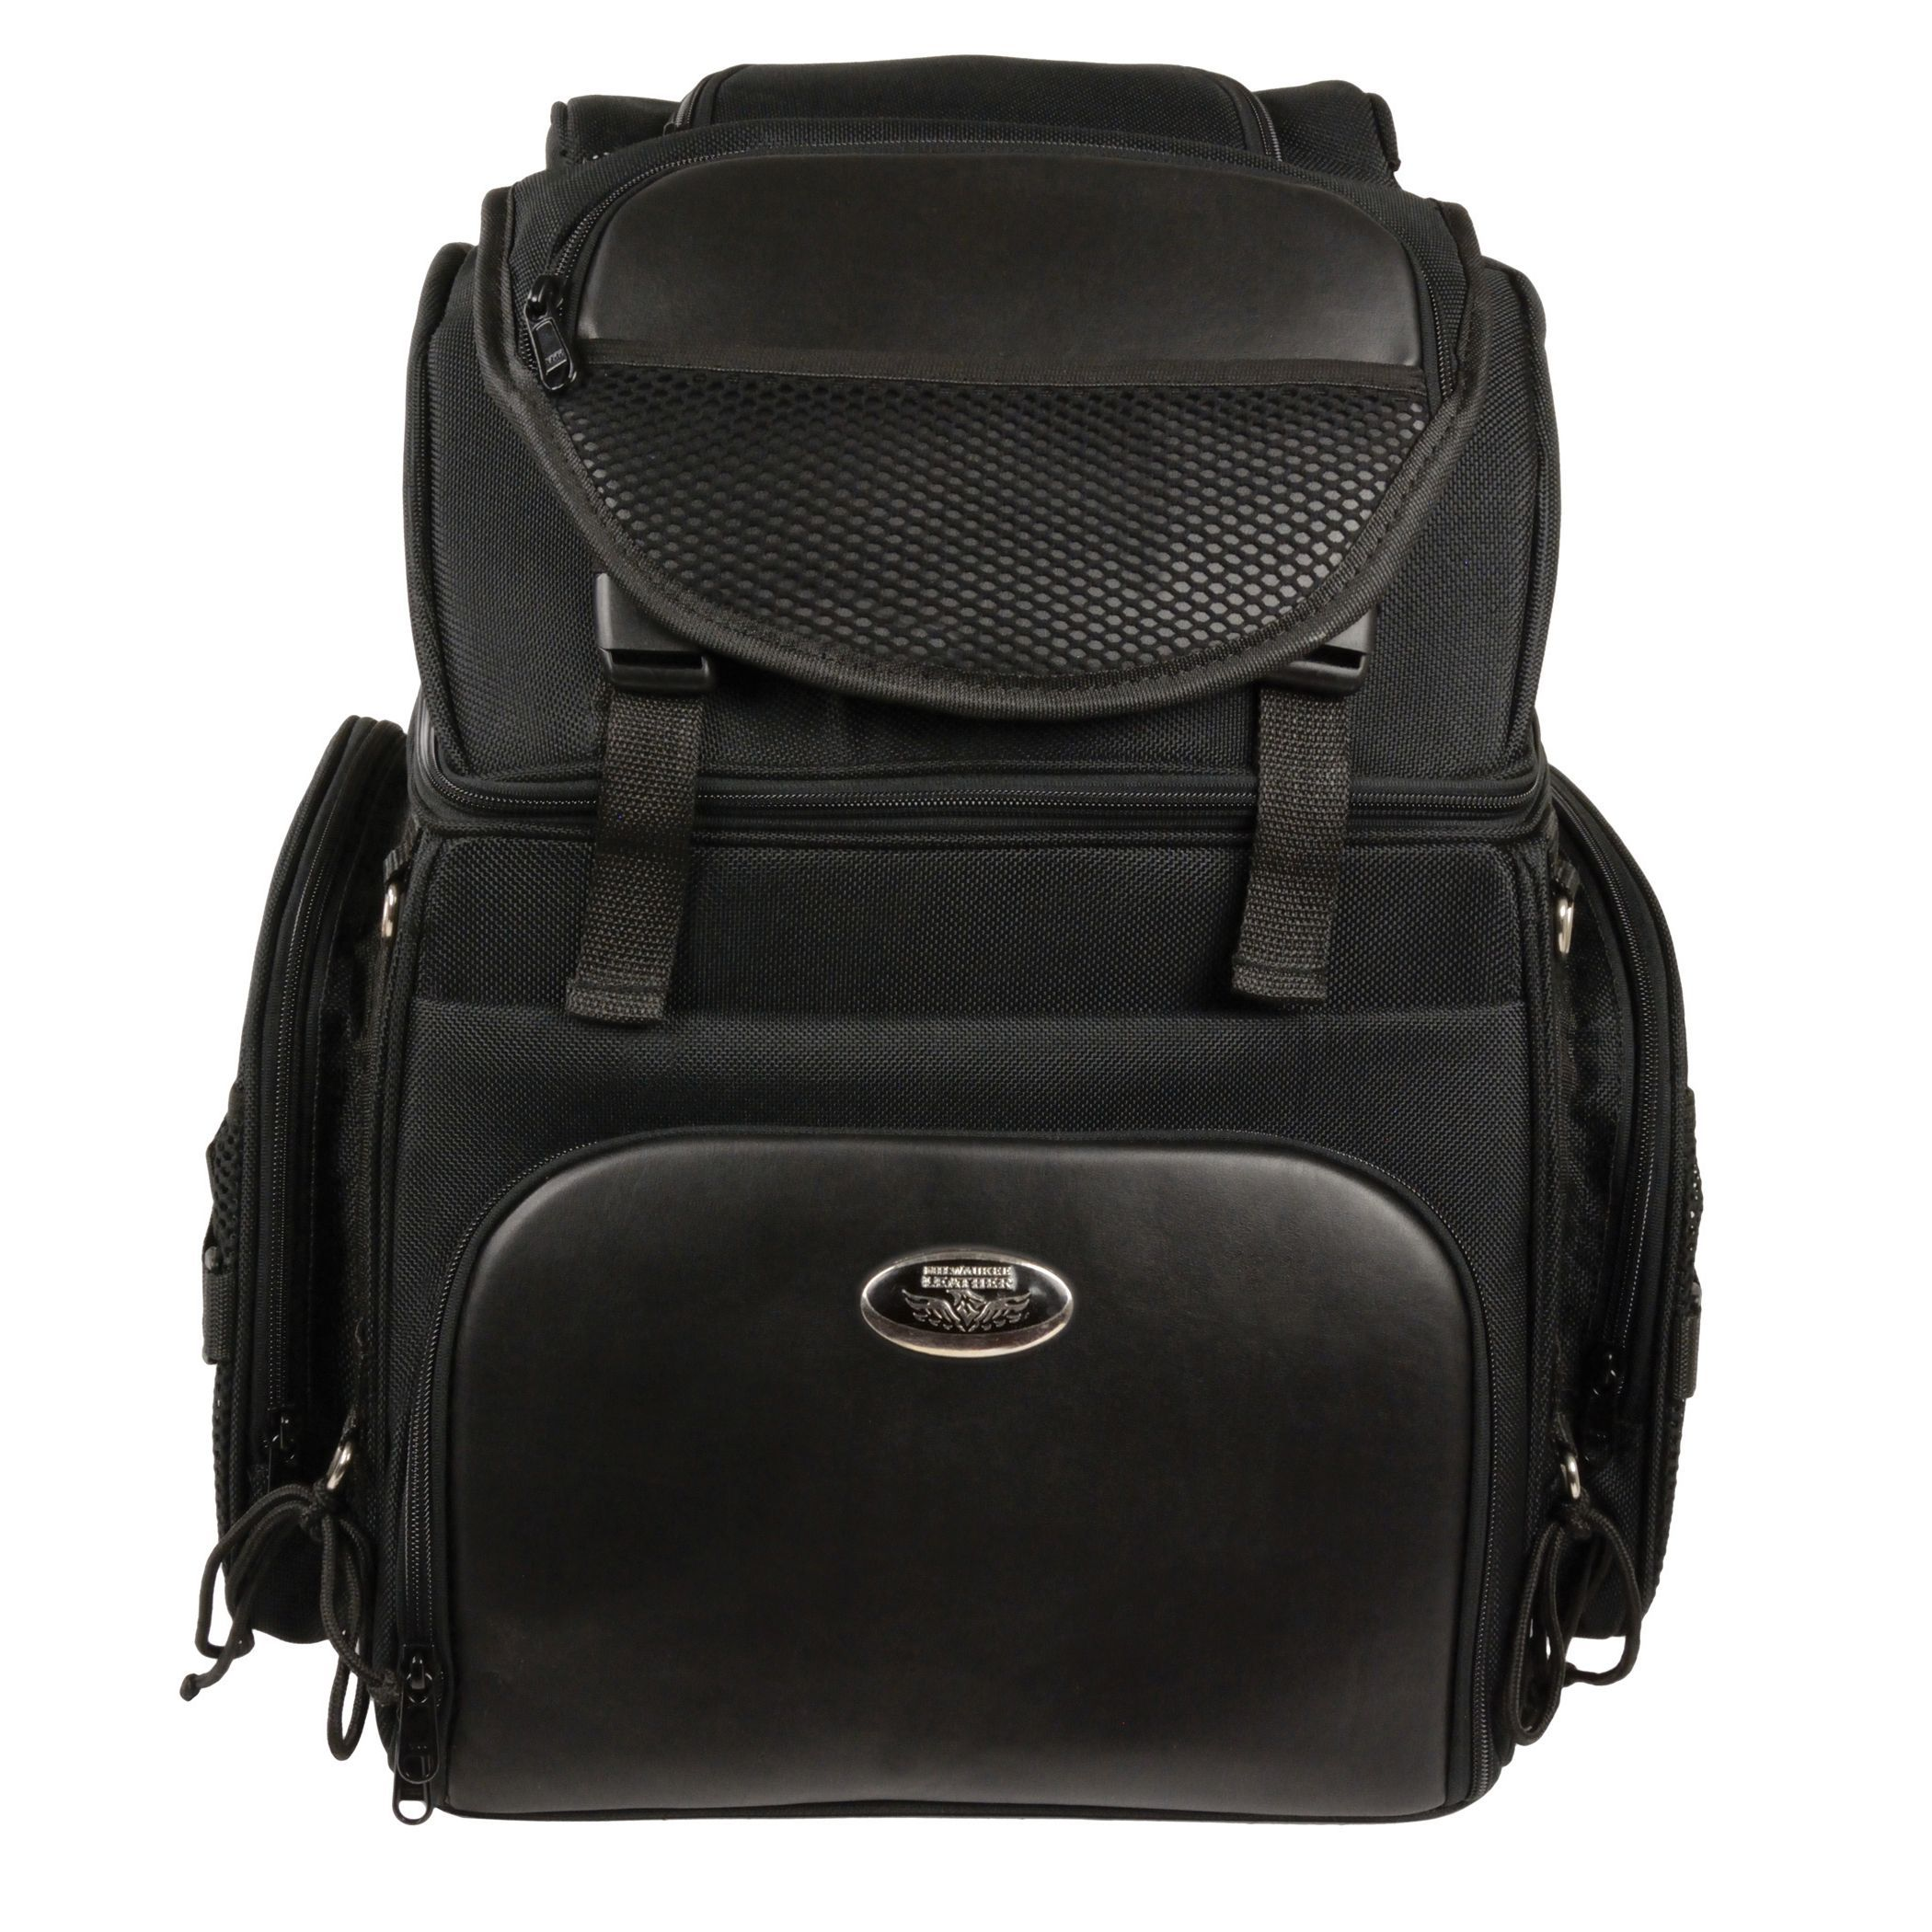 Large nylon sissy bar bag with back pack straps large nylon sissy